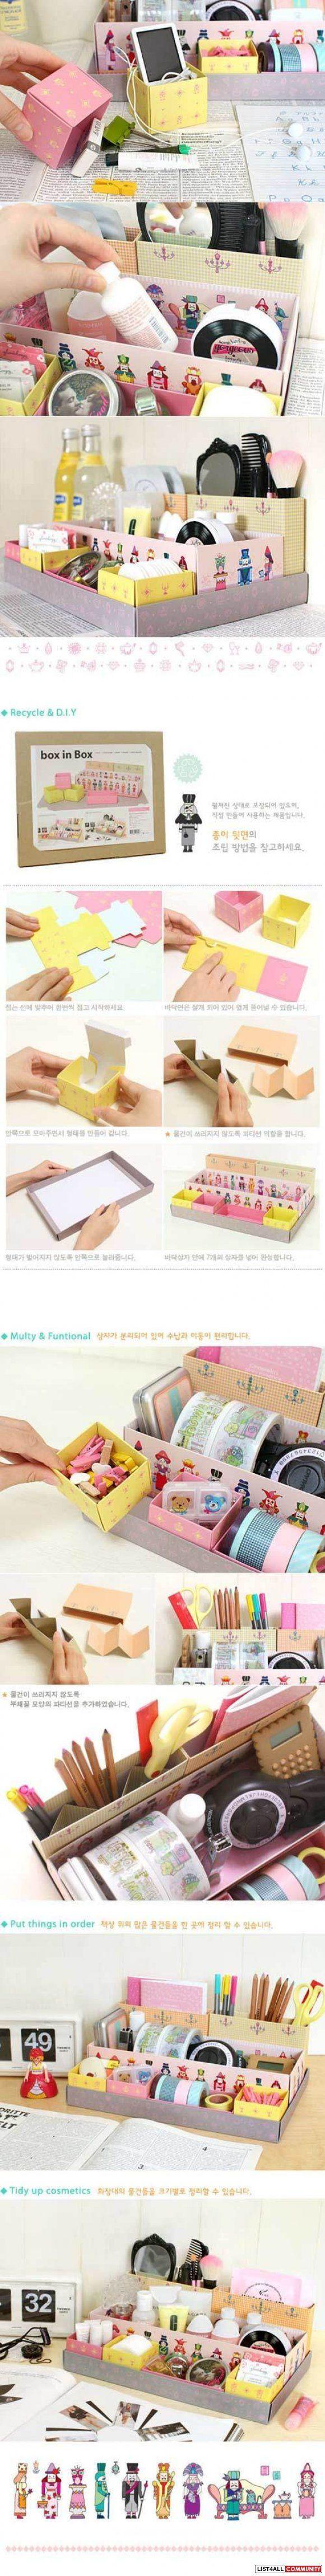 BOX IN BOX DIY Makeup / cosmetics / stationary organizer box